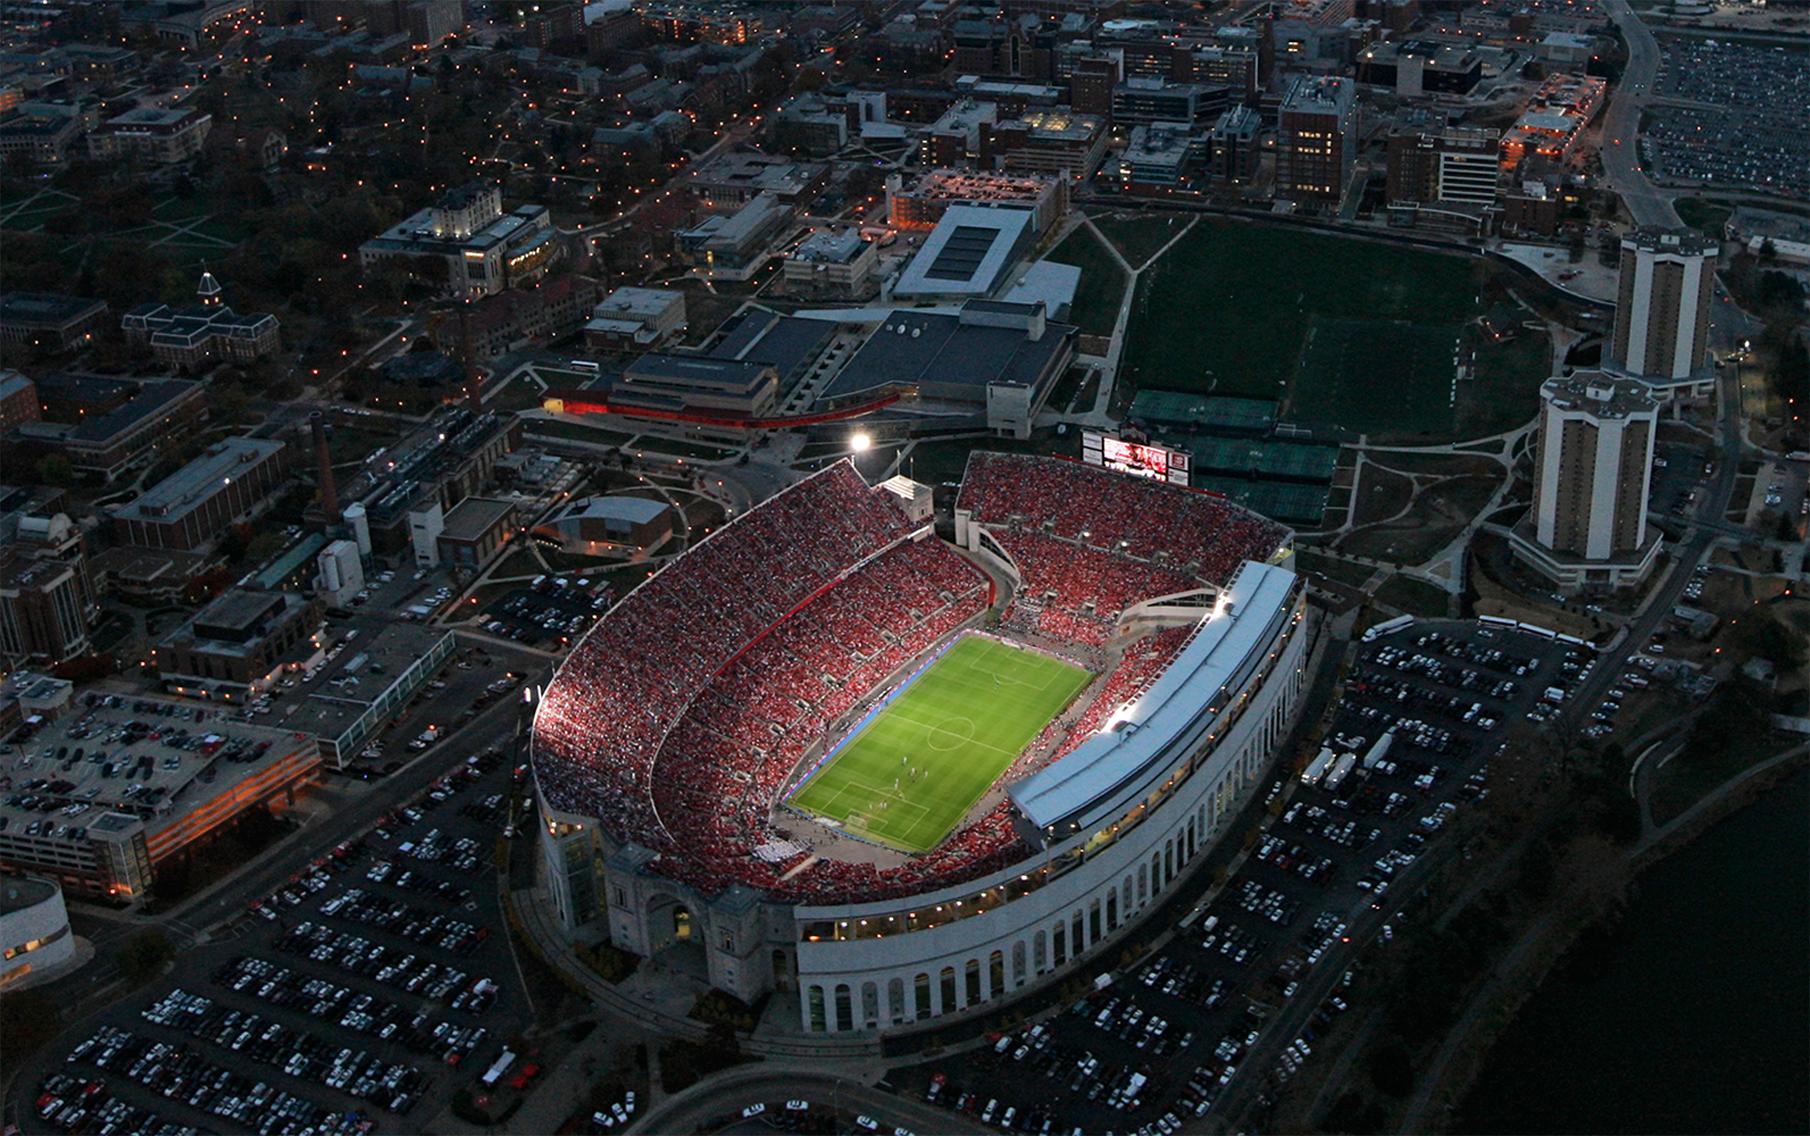 Ohio Stadium at night, under the lights